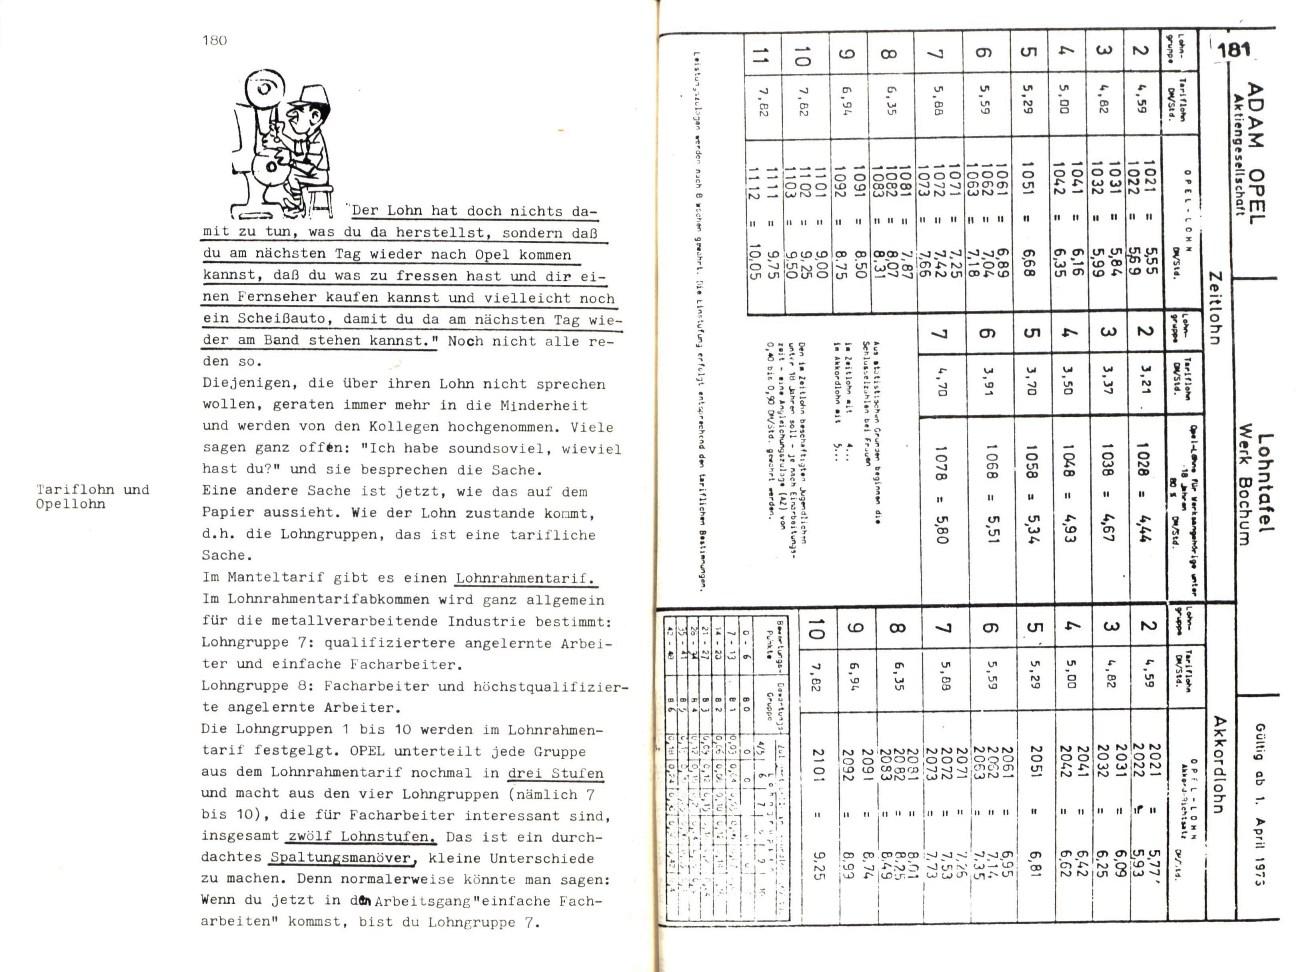 Bochum_IGM_Opel_PG_Opel_streikt_1973_093